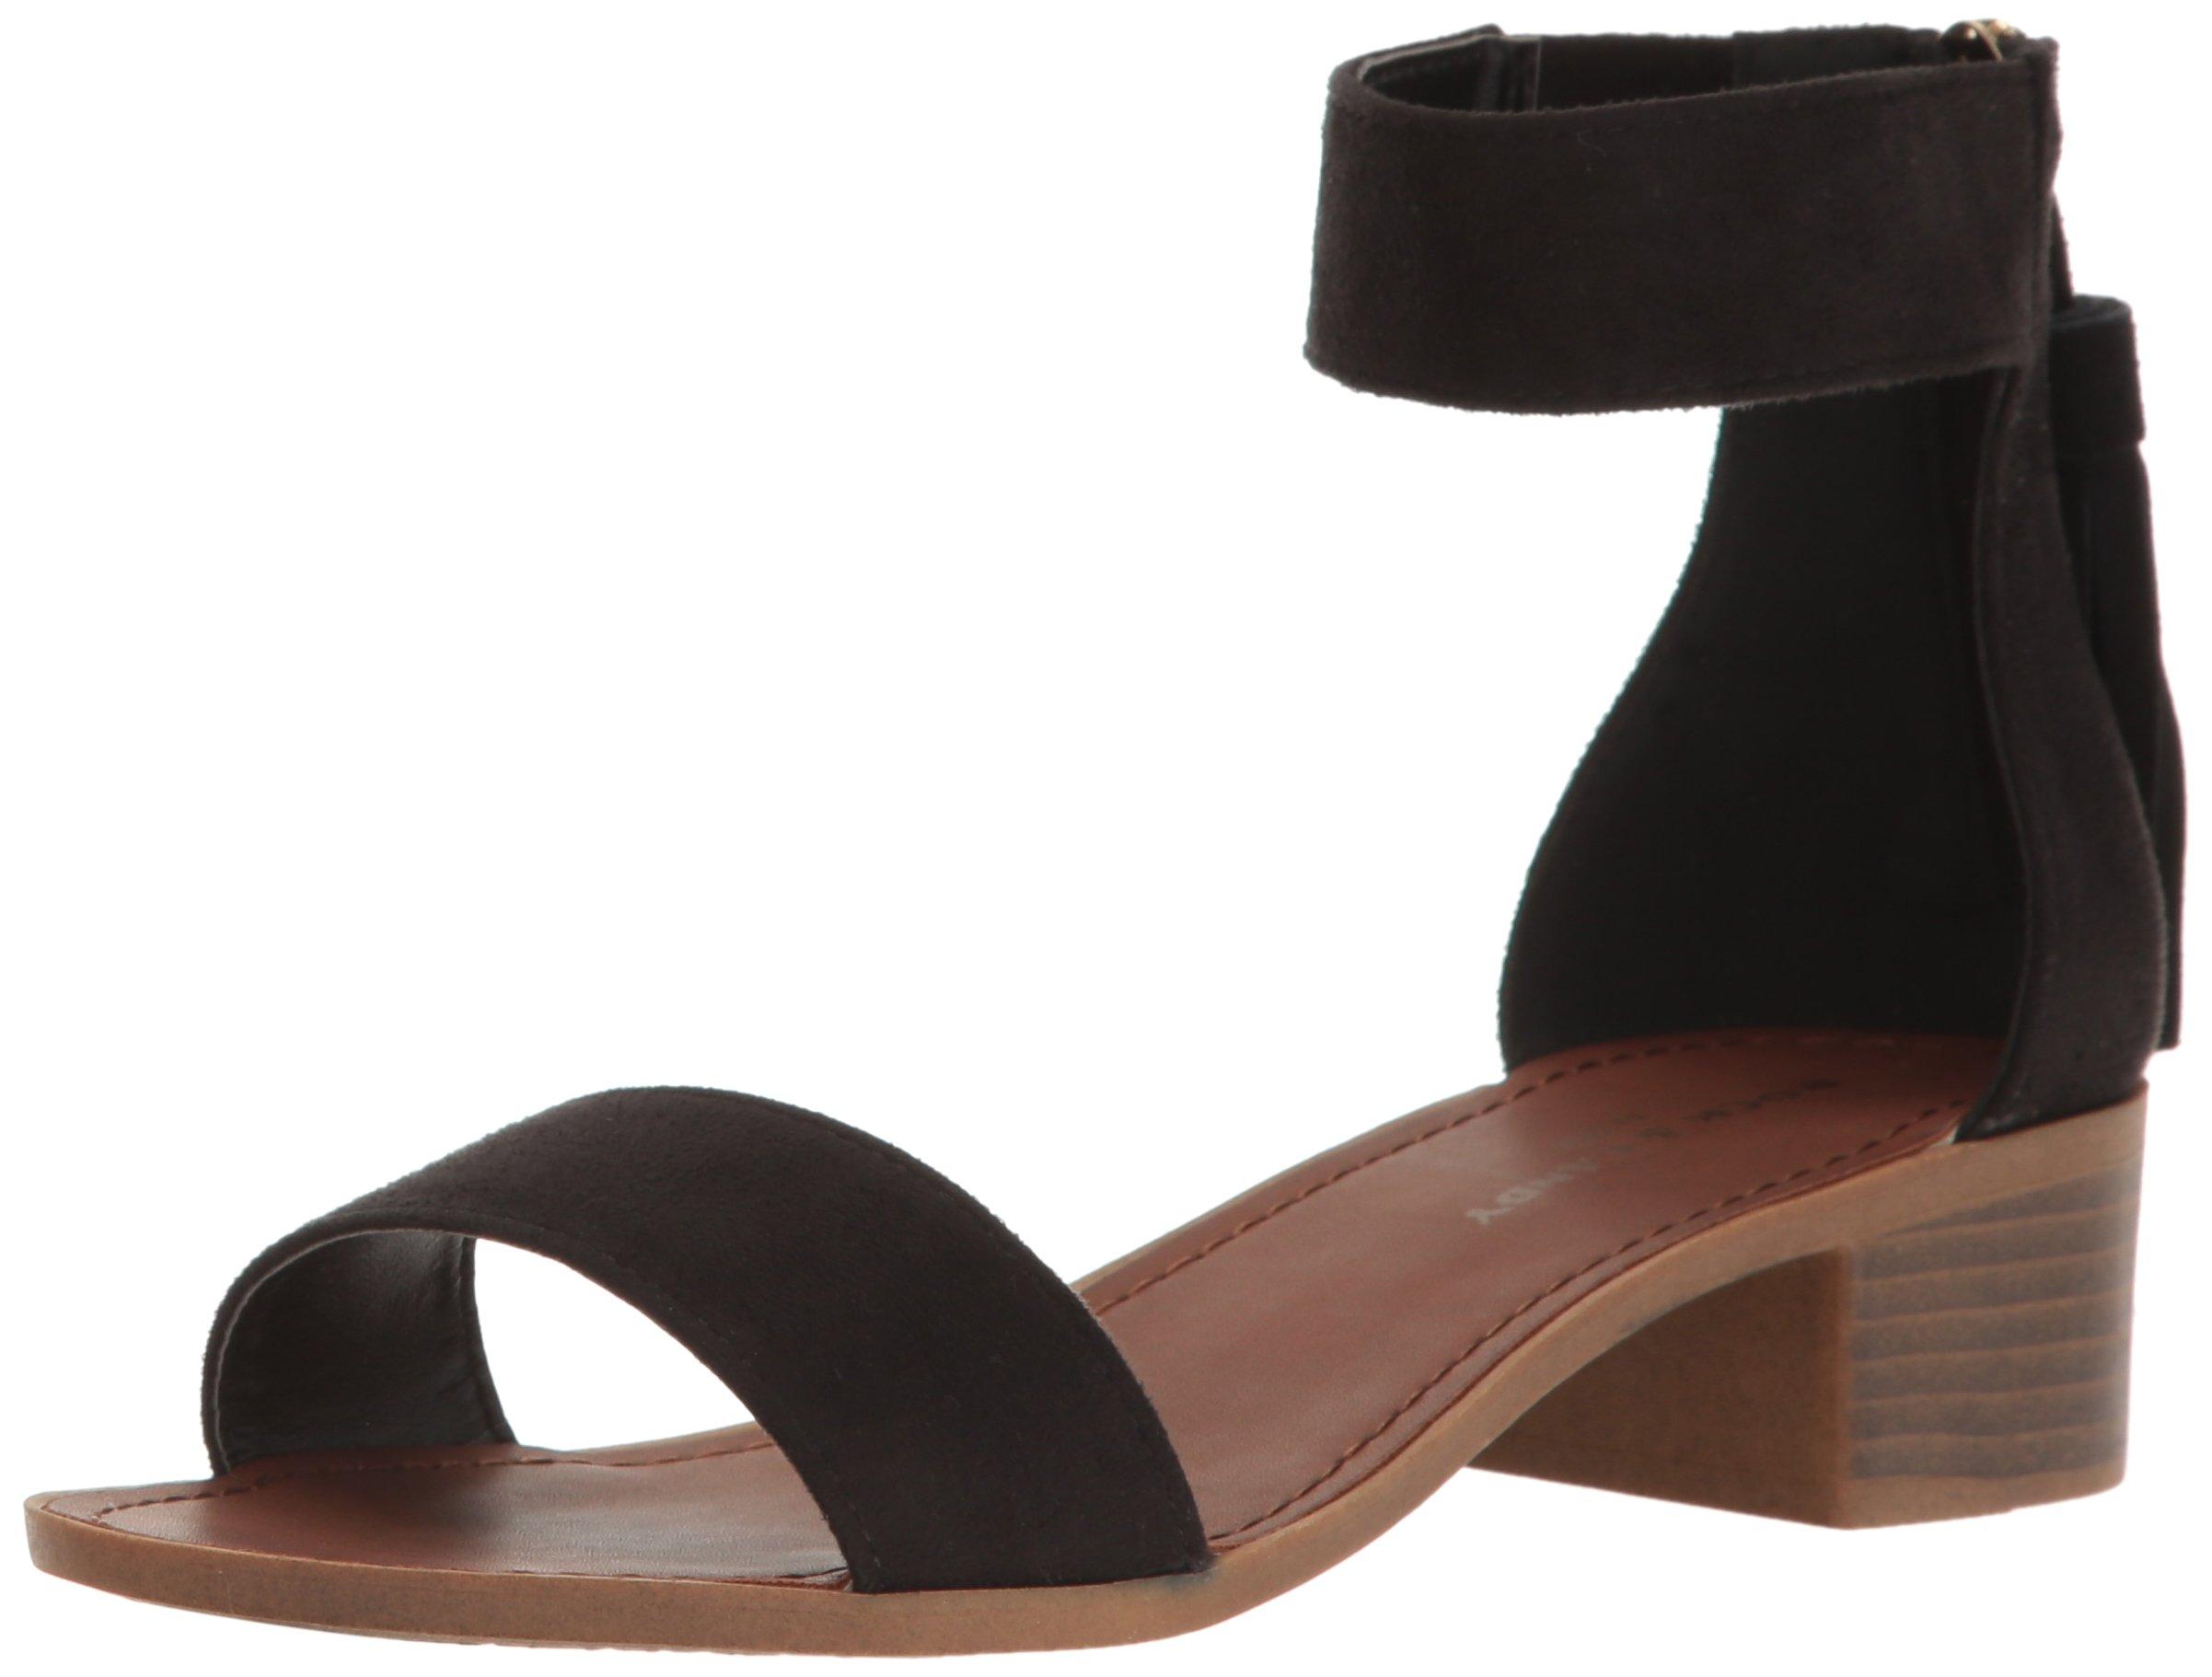 Rock & Candy Women's Nancie Flat Sandal, Blk Sudette a, 6 M US